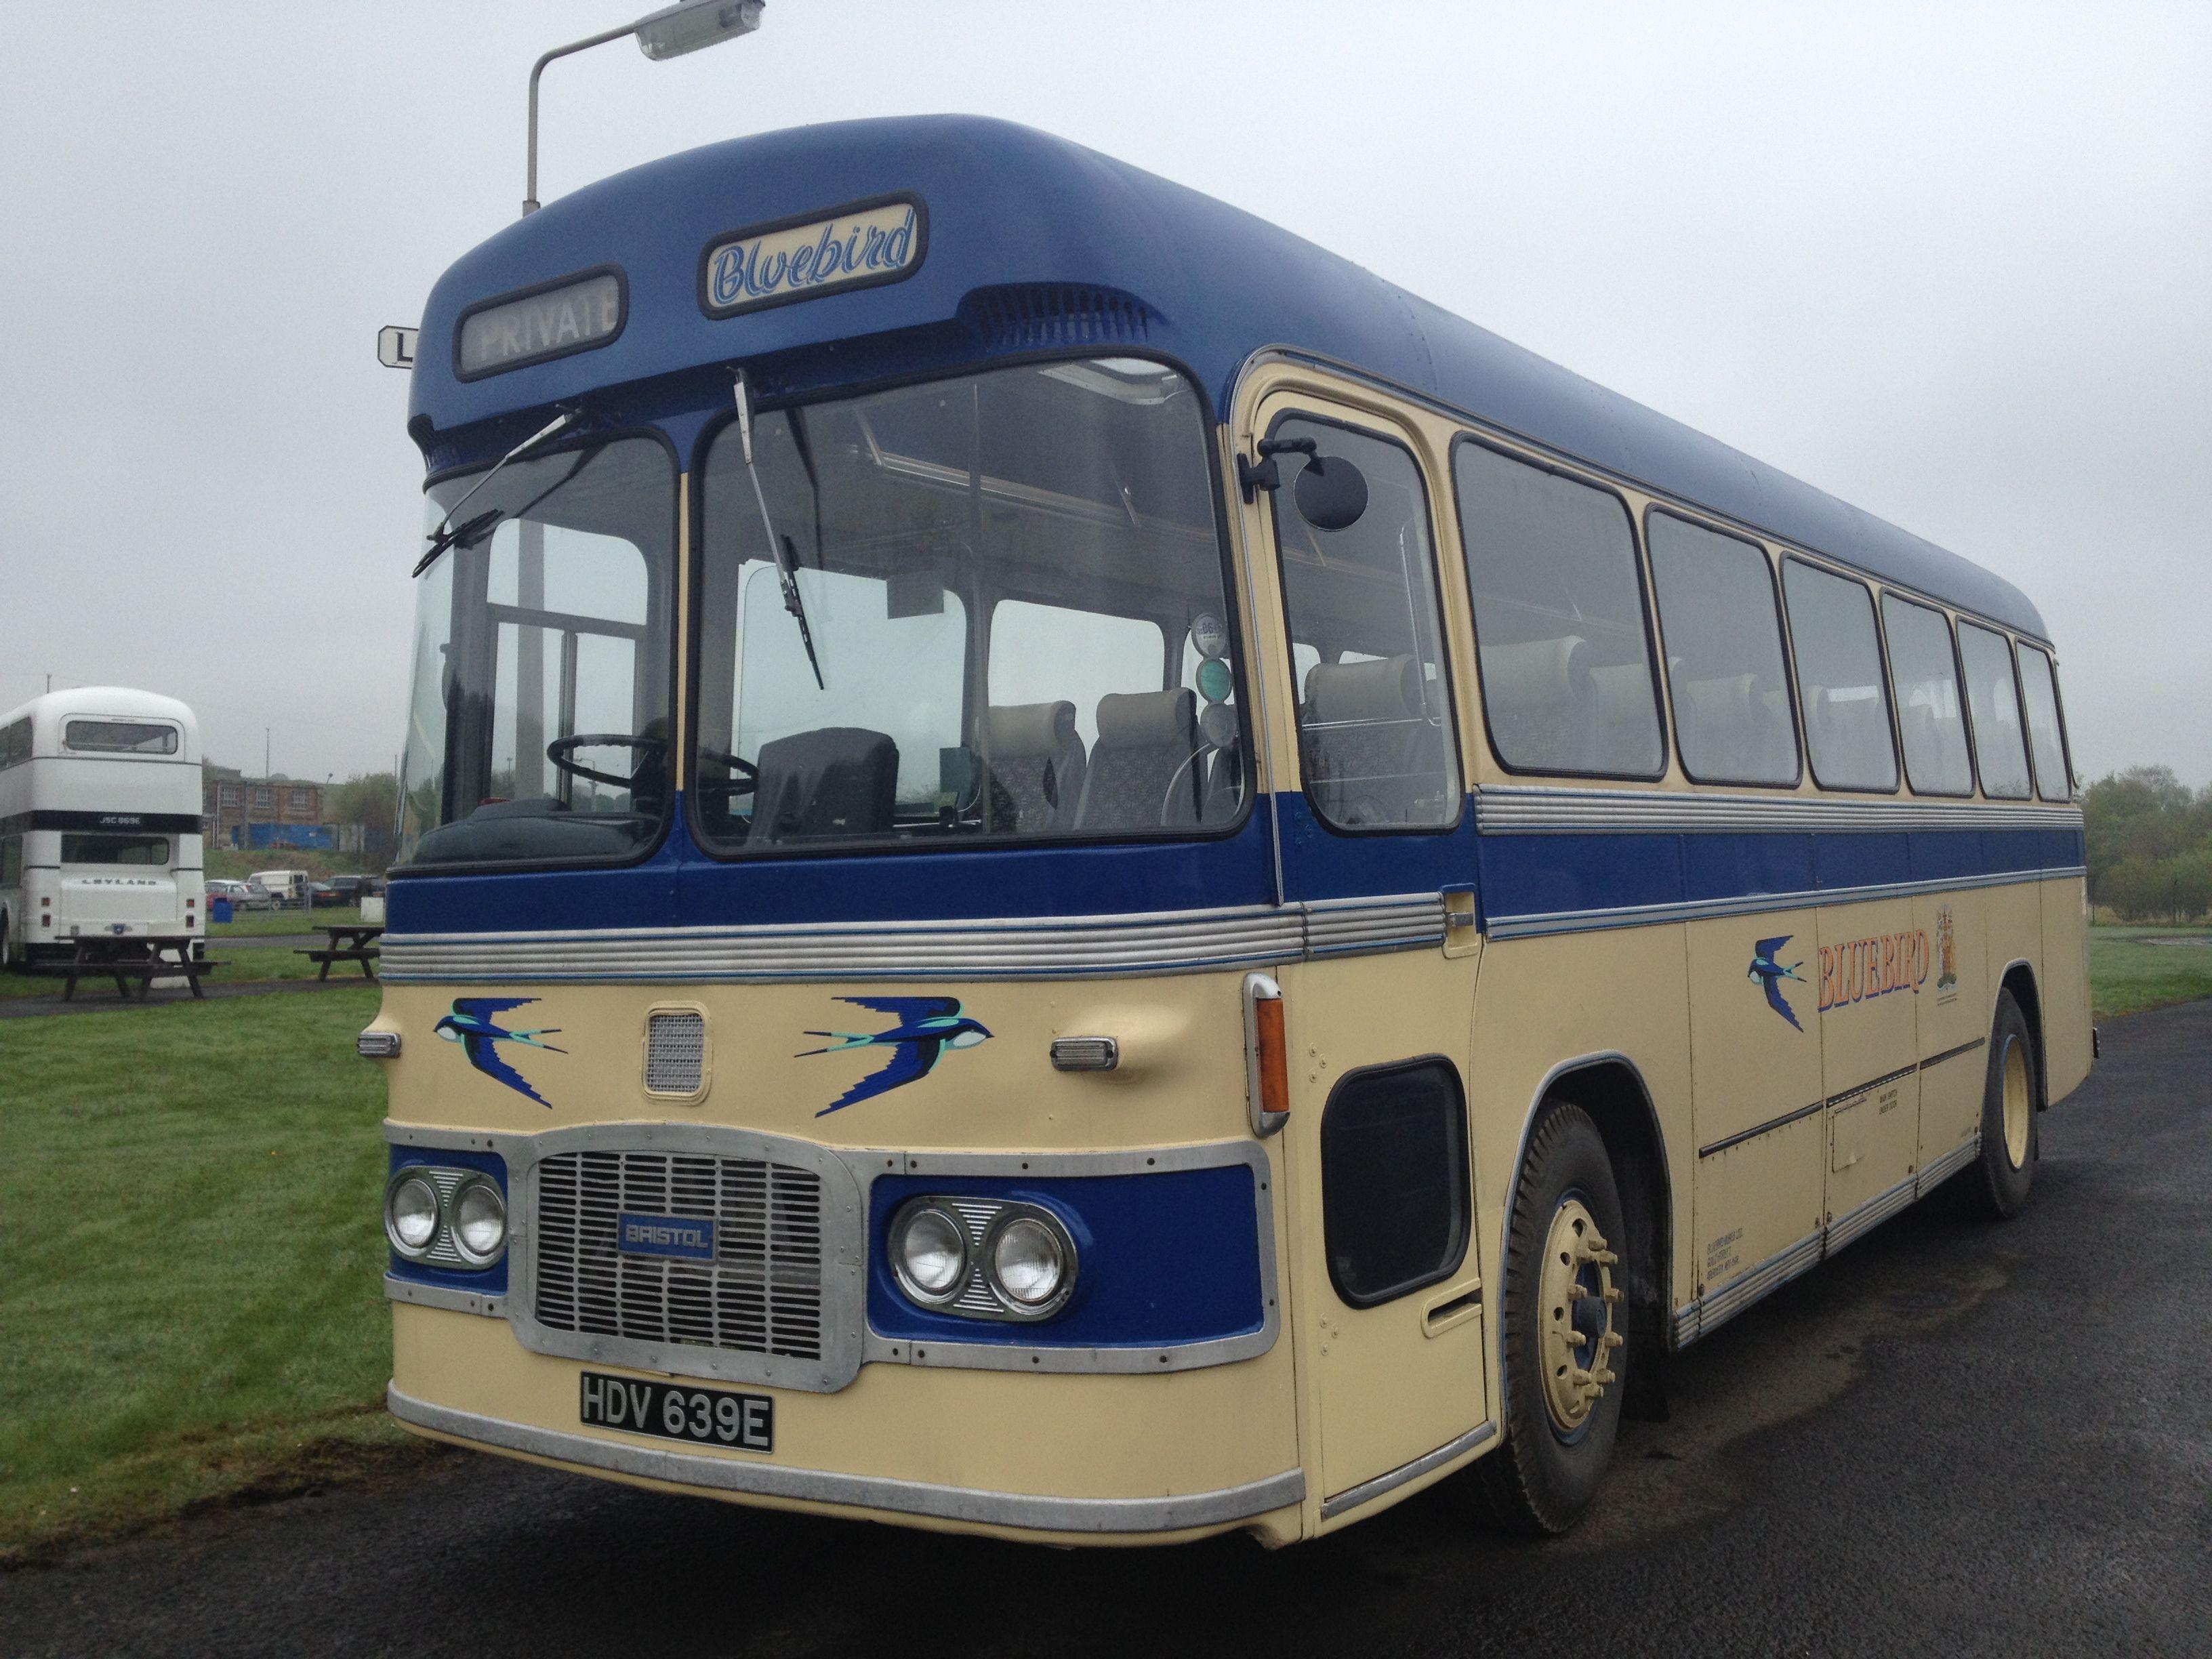 A1 minibus and coach services visit to scottish bus museum